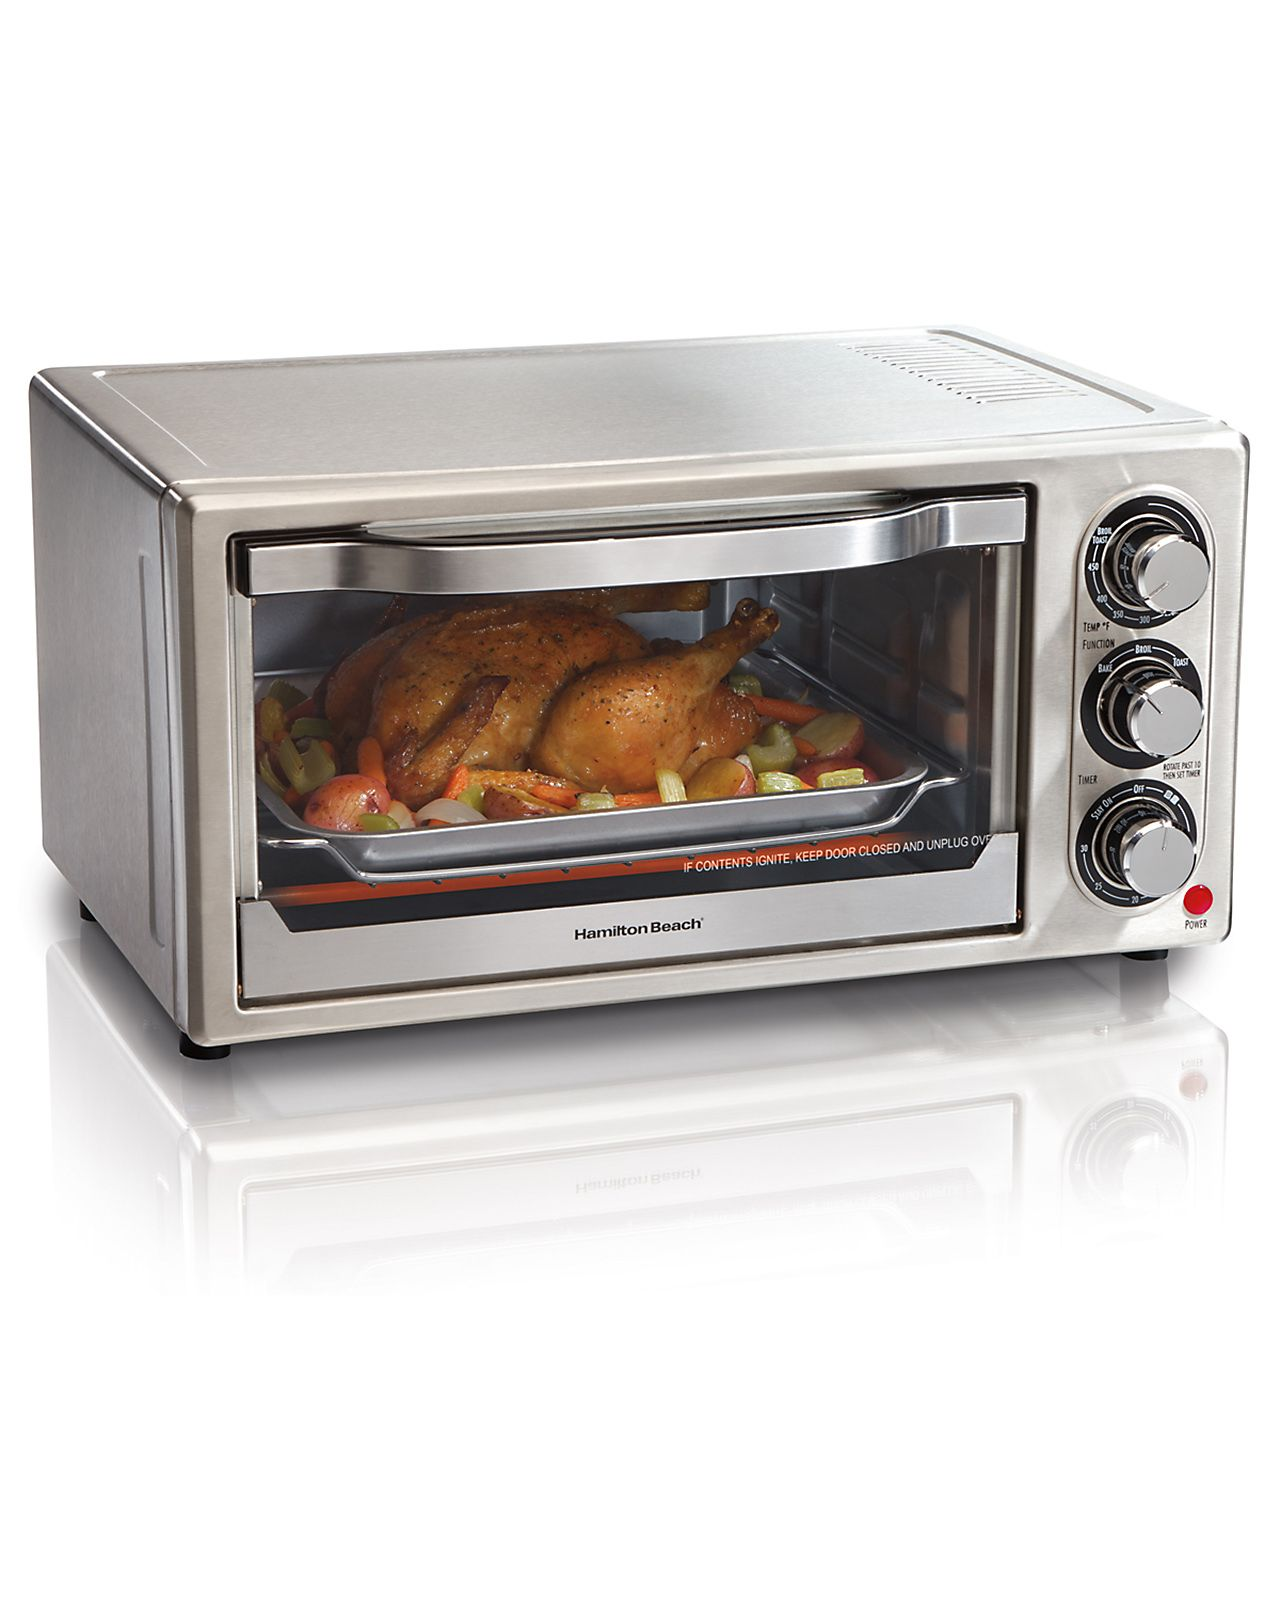 Hamilton Beach Brands31511 6 Slice Toaster Oven Stainless Steel